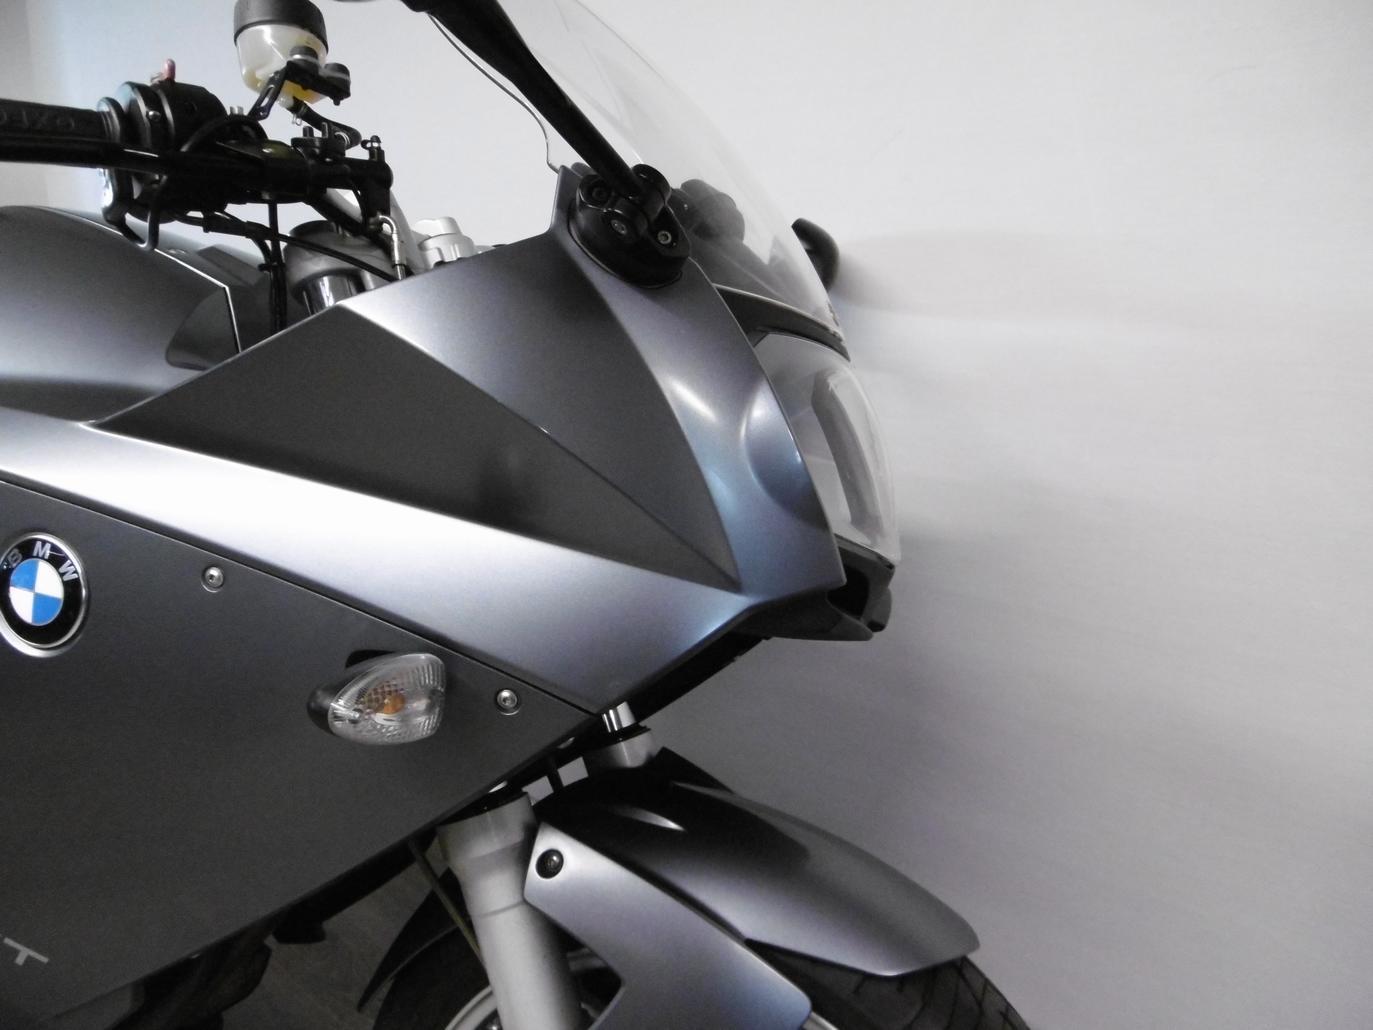 BMW F 800 ST ABS